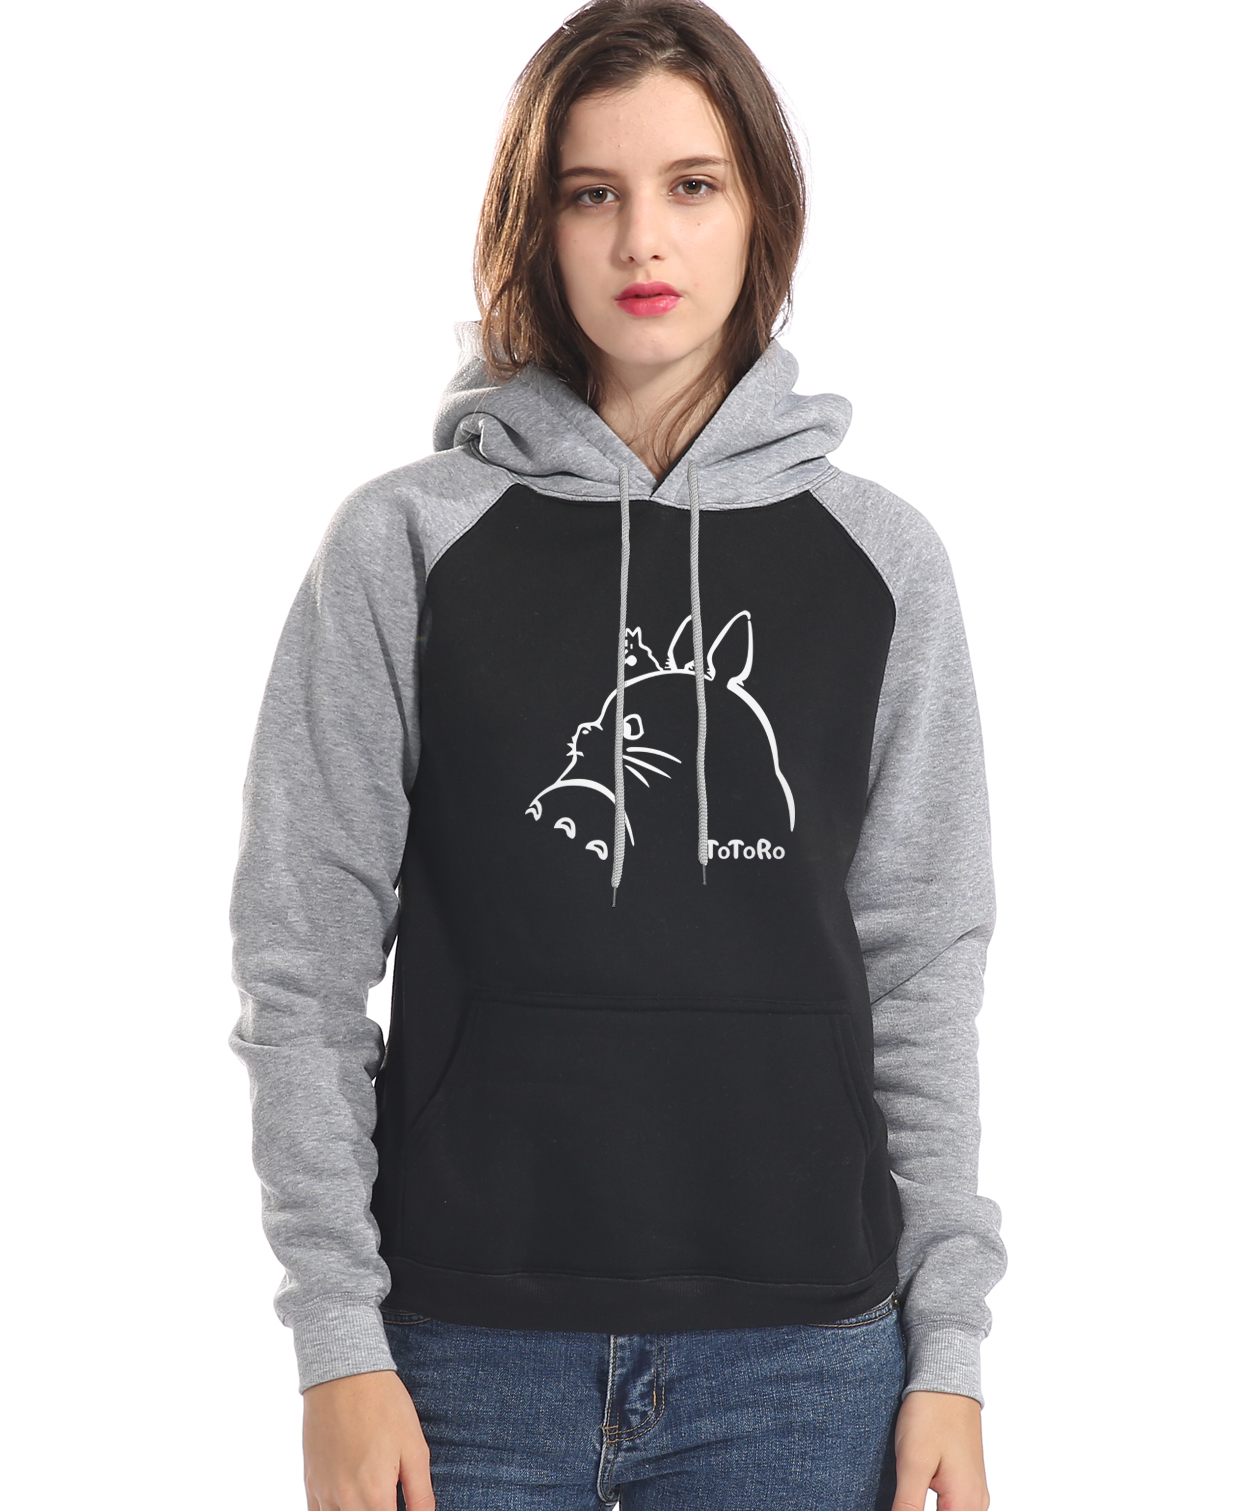 women high quality pullovers fall winter fleece raglan long sleeve hooded 2019 kawaii Cartoon hoodies femme Sweatshirt tracksuit